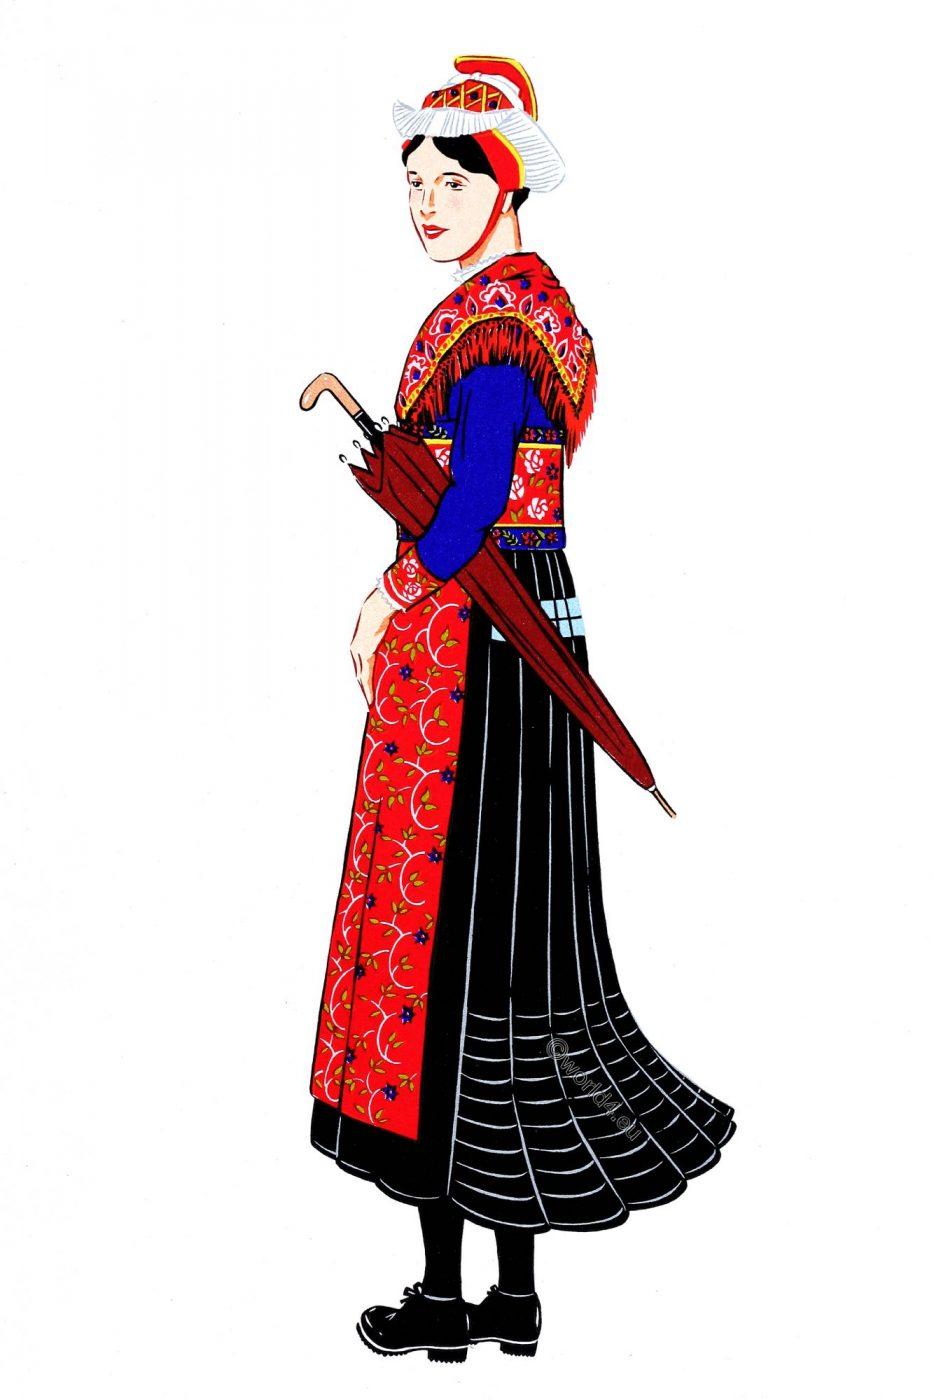 French, Traditional clothing, Savoy, costume, Saint-Sorlin